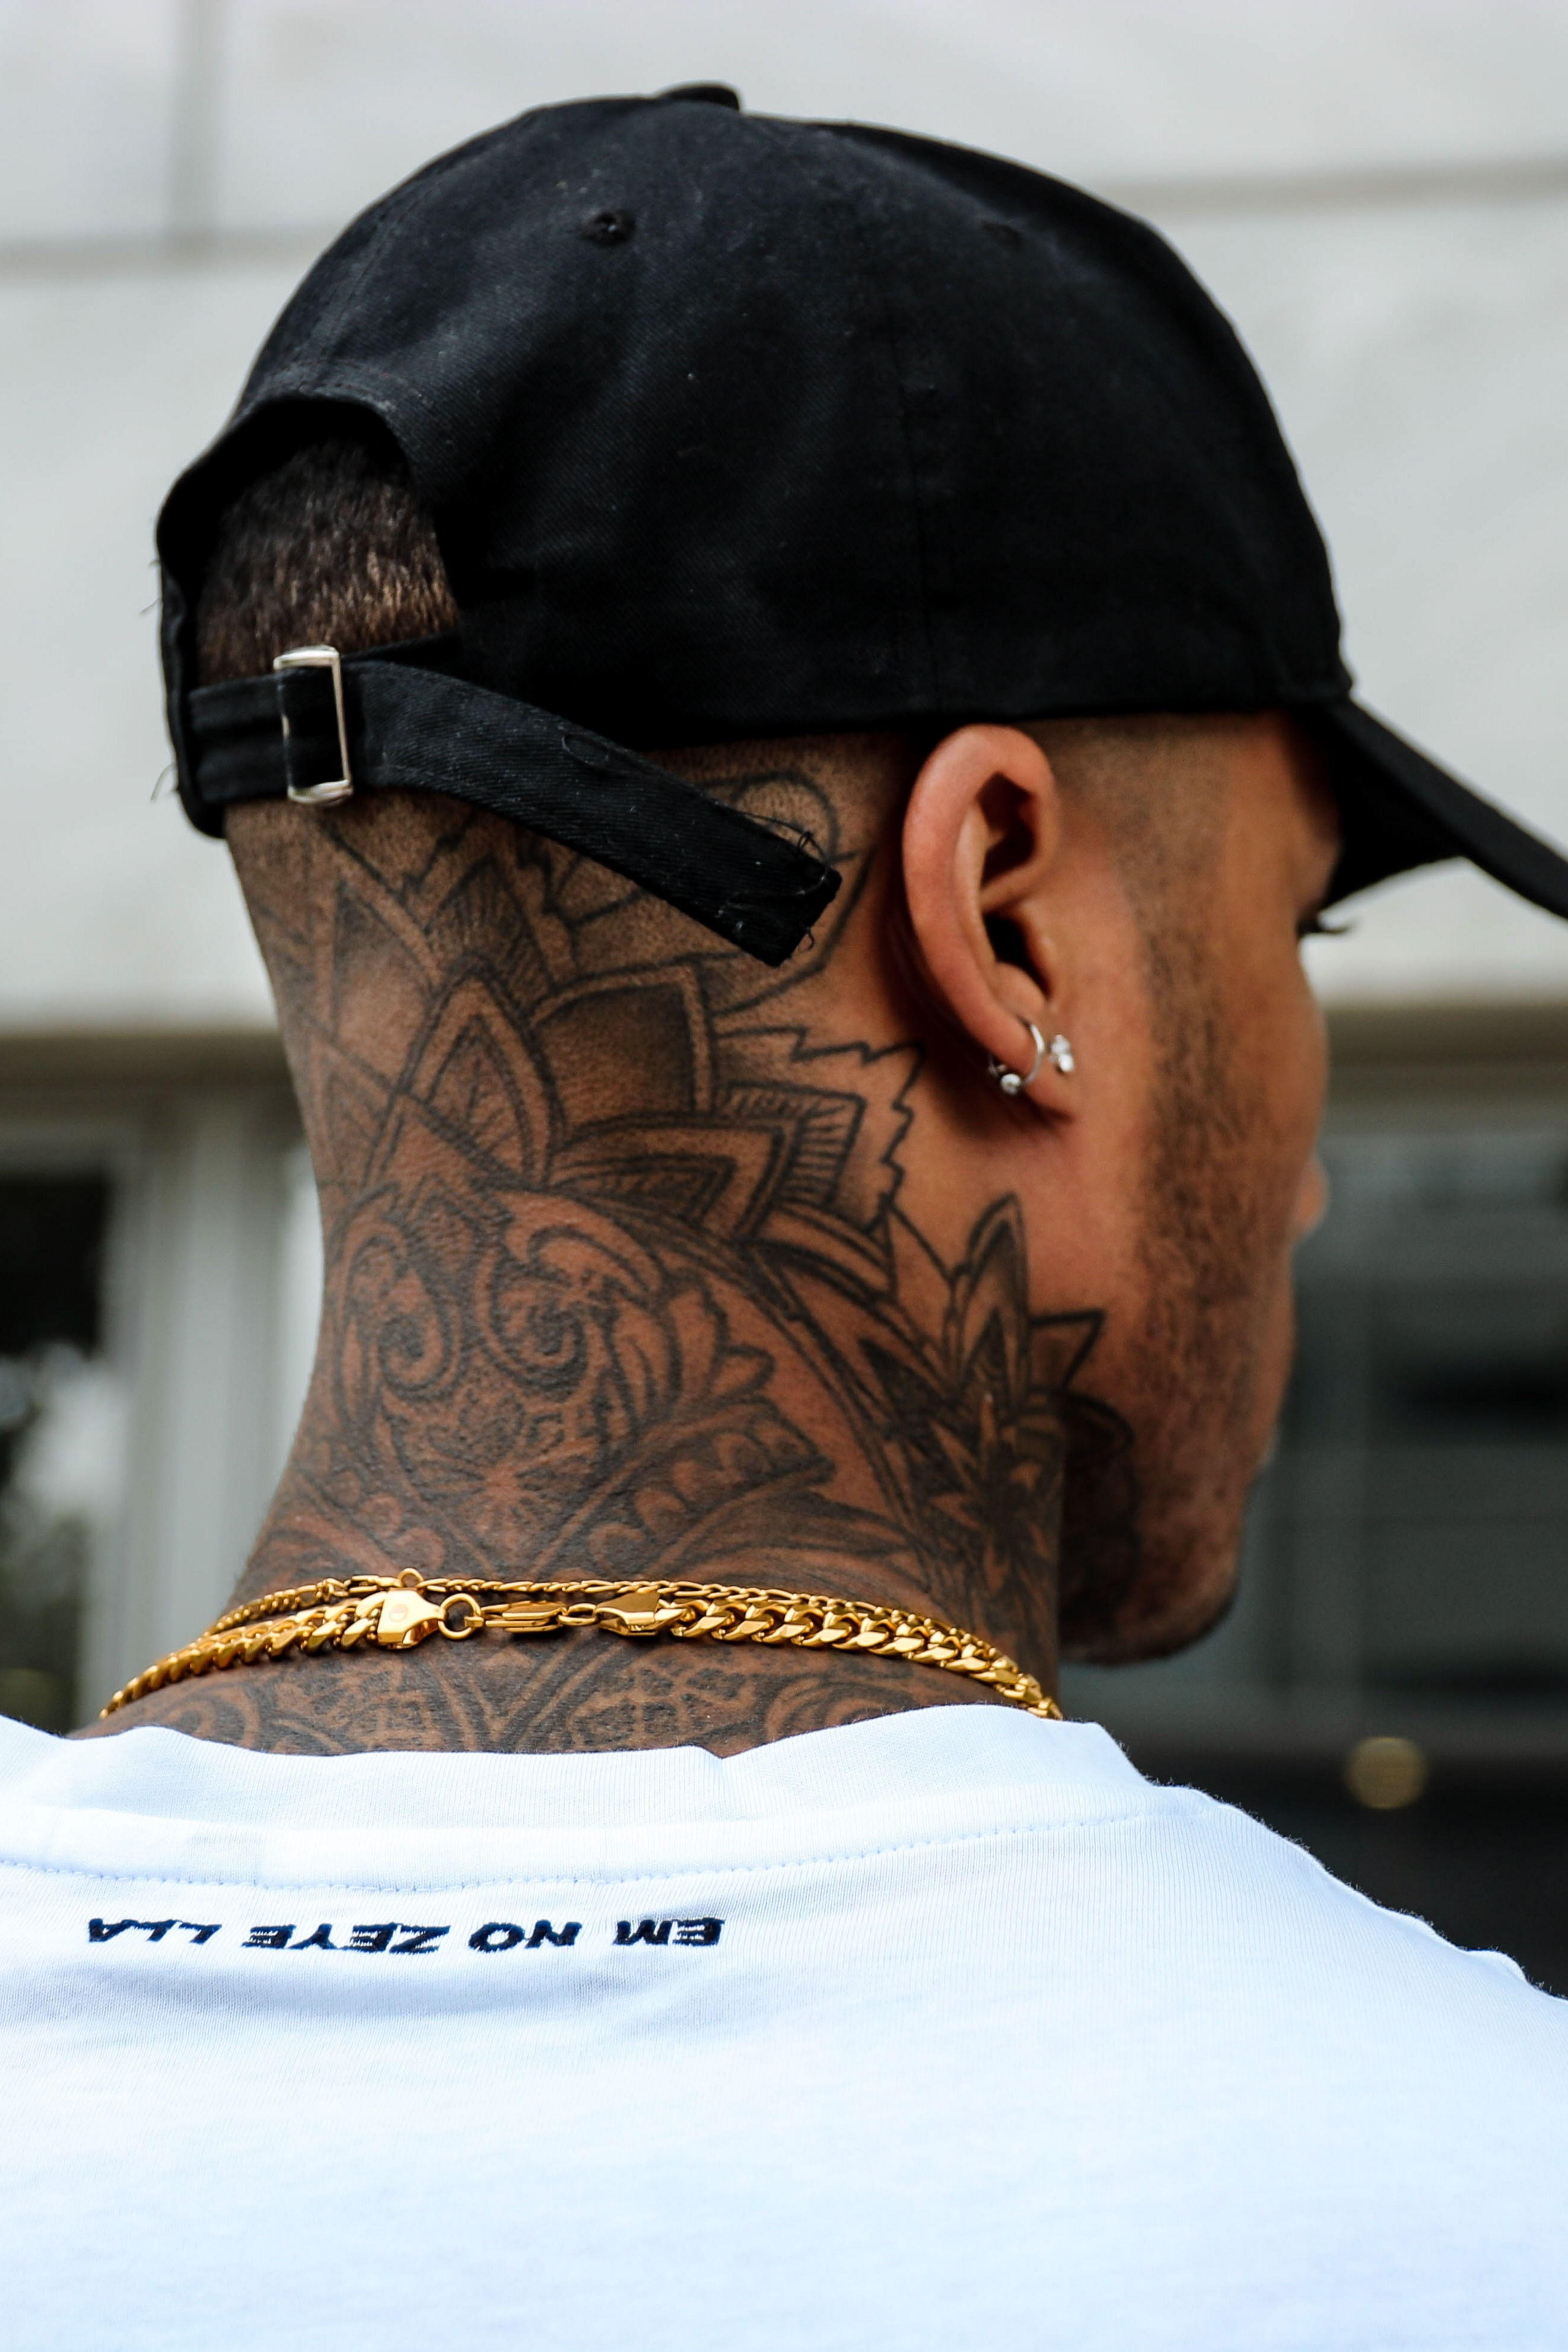 Repin By At Social Media Marketing Pinterest Marketing Specialists Atsocialmedia Co Uk In 2020 Back Of Neck Tattoo Men Back Of Neck Tattoo Tattoos